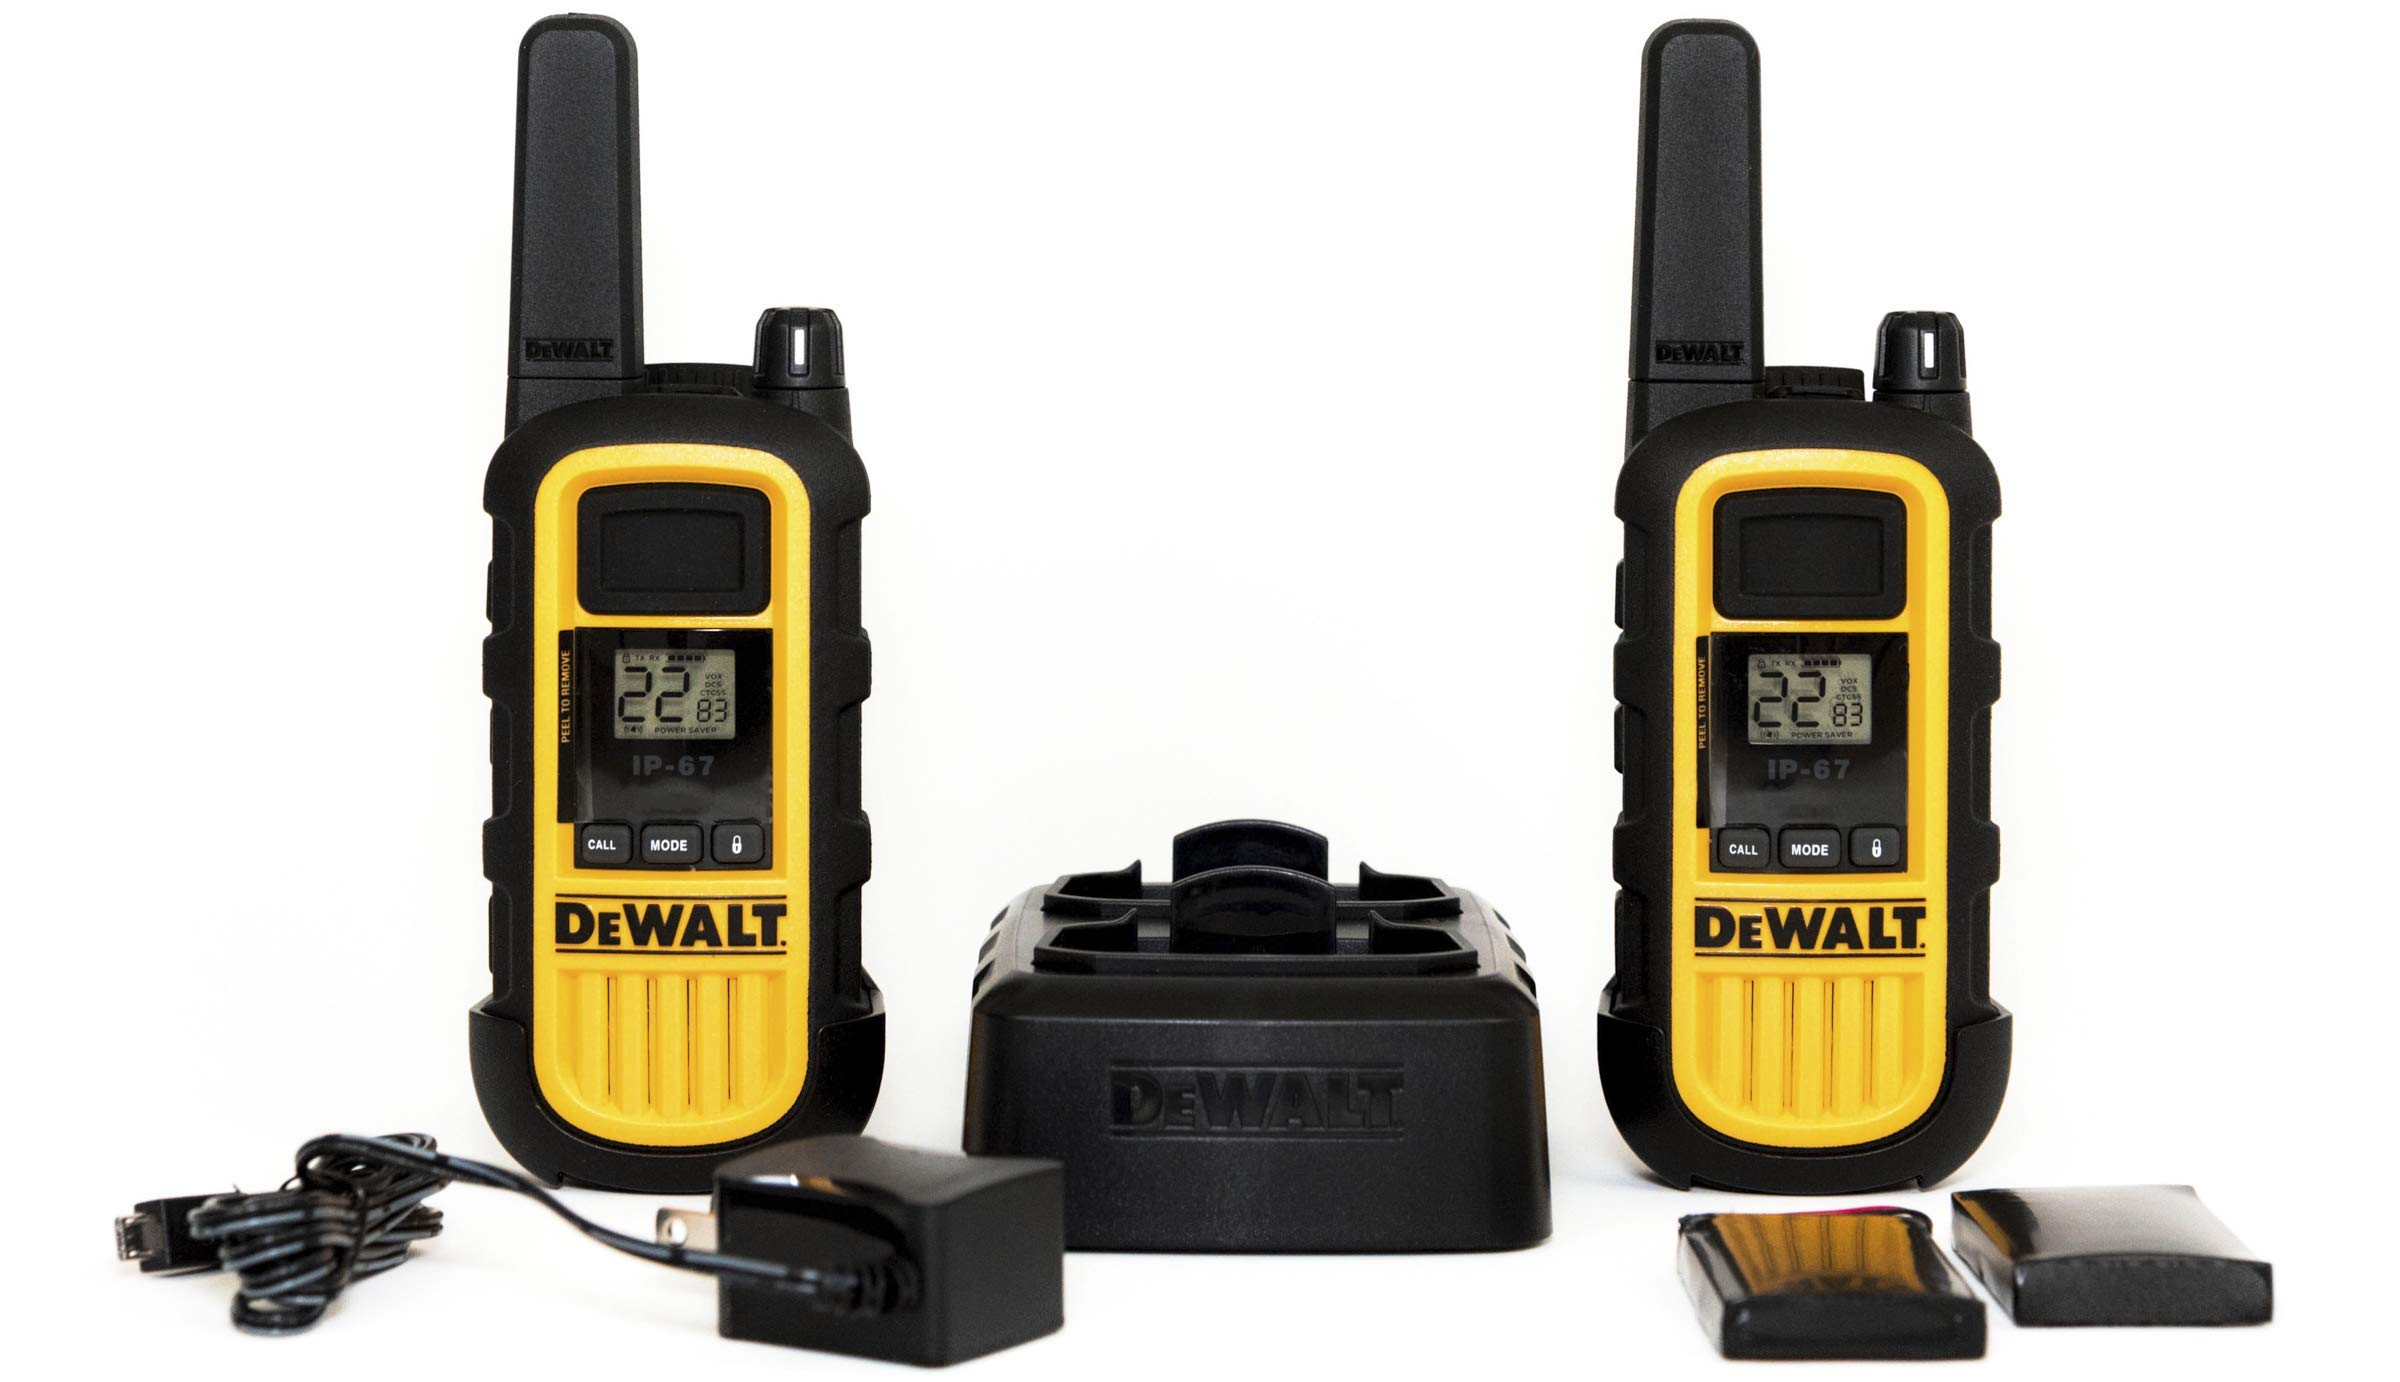 DeWALT DXFRS800 2W Walkie Talkies Heavy Duty Business Two-Way Radios (Pair) by DEWALT (Image #1)